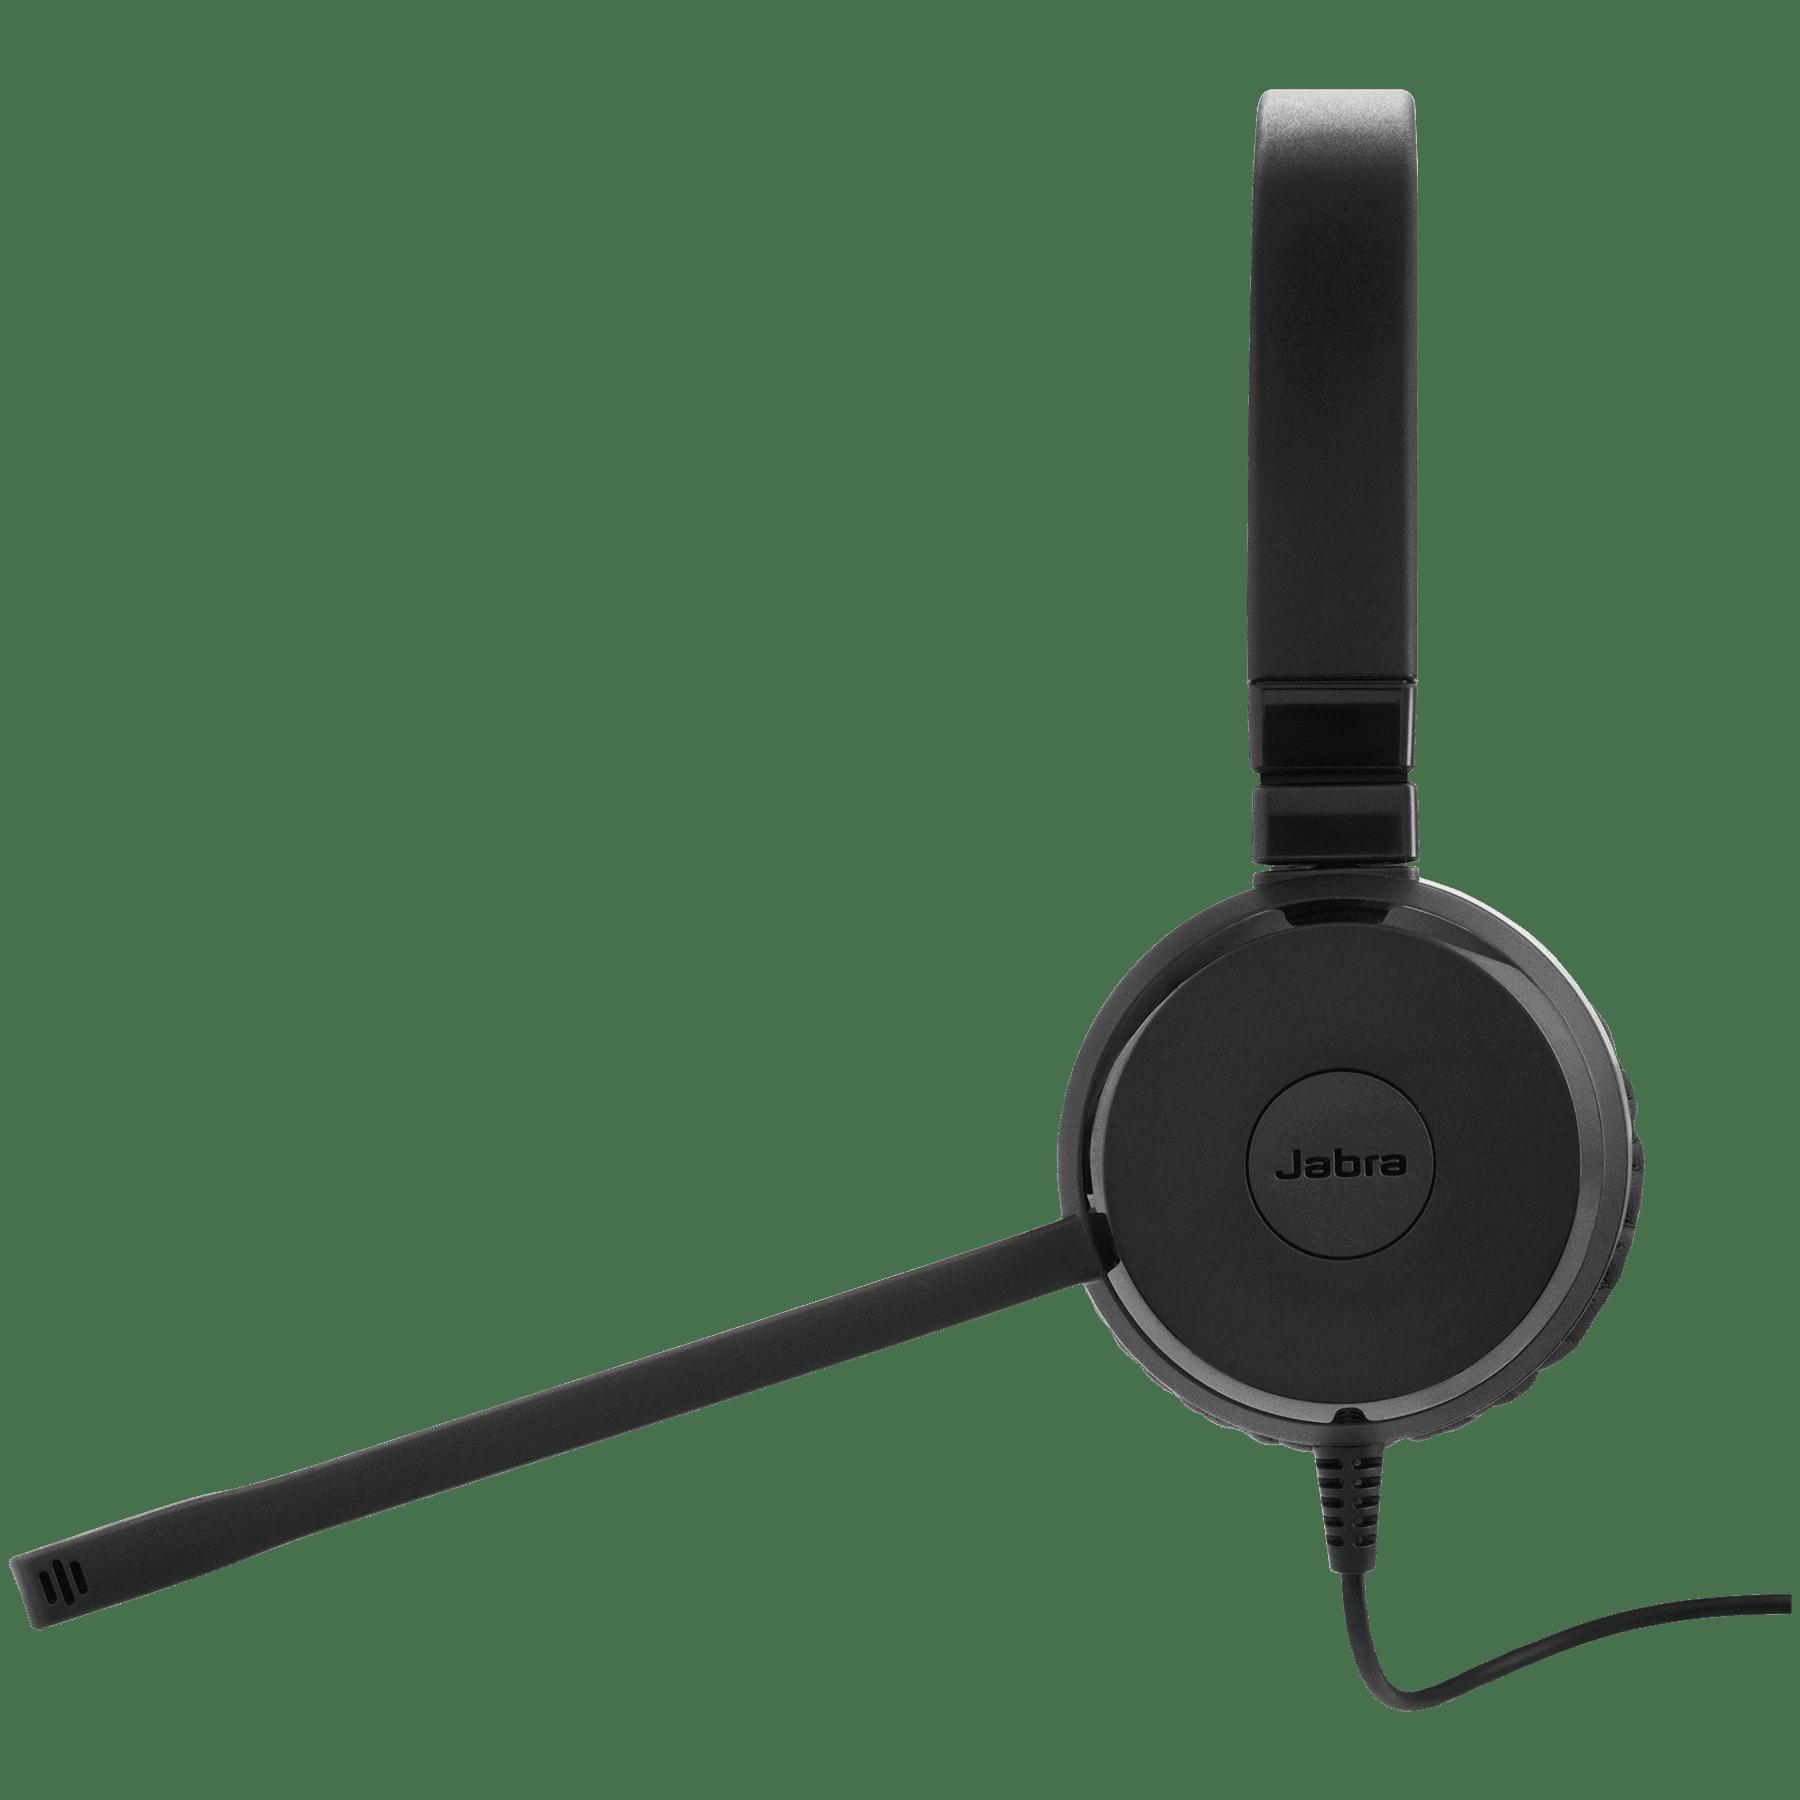 Jabra Evolve 30 Ii Uc Stereo Headset Headsets Direct